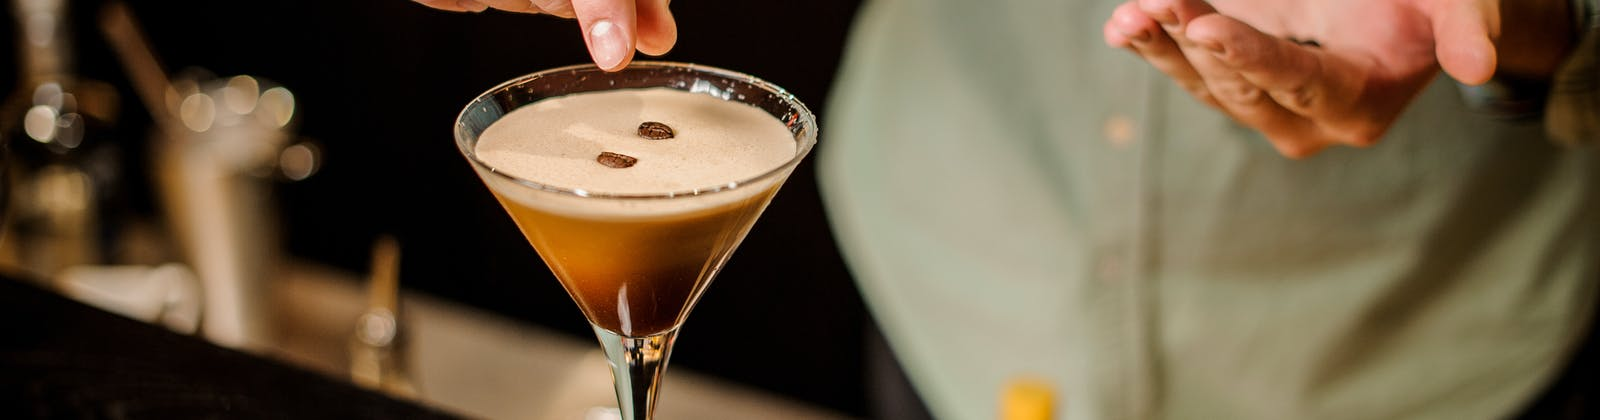 Espresso Martini being made at a restaurant bar